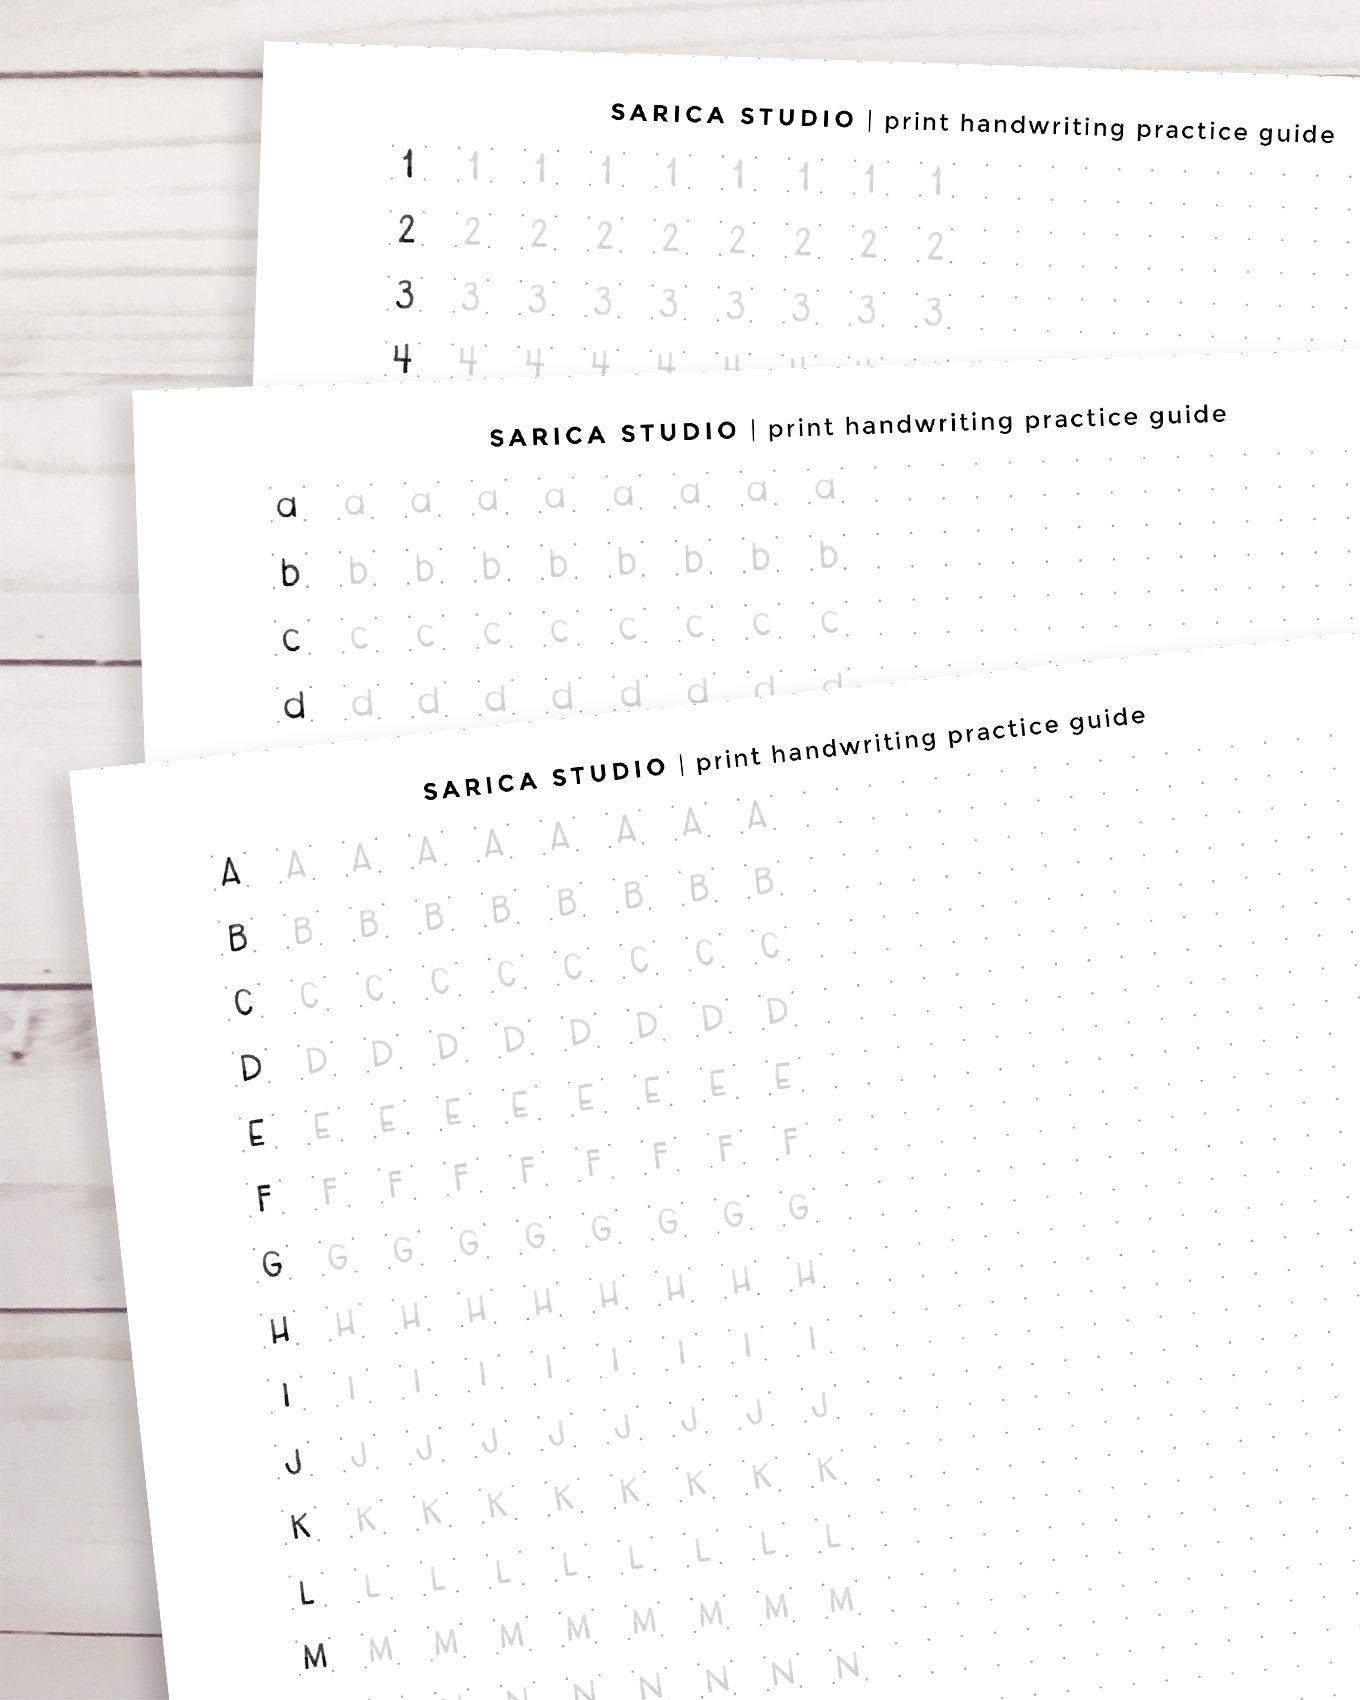 Adult Handwriting Worksheets Free Printable   Printable Worksheets and  Activities for Teachers [ 1700 x 1360 Pixel ]